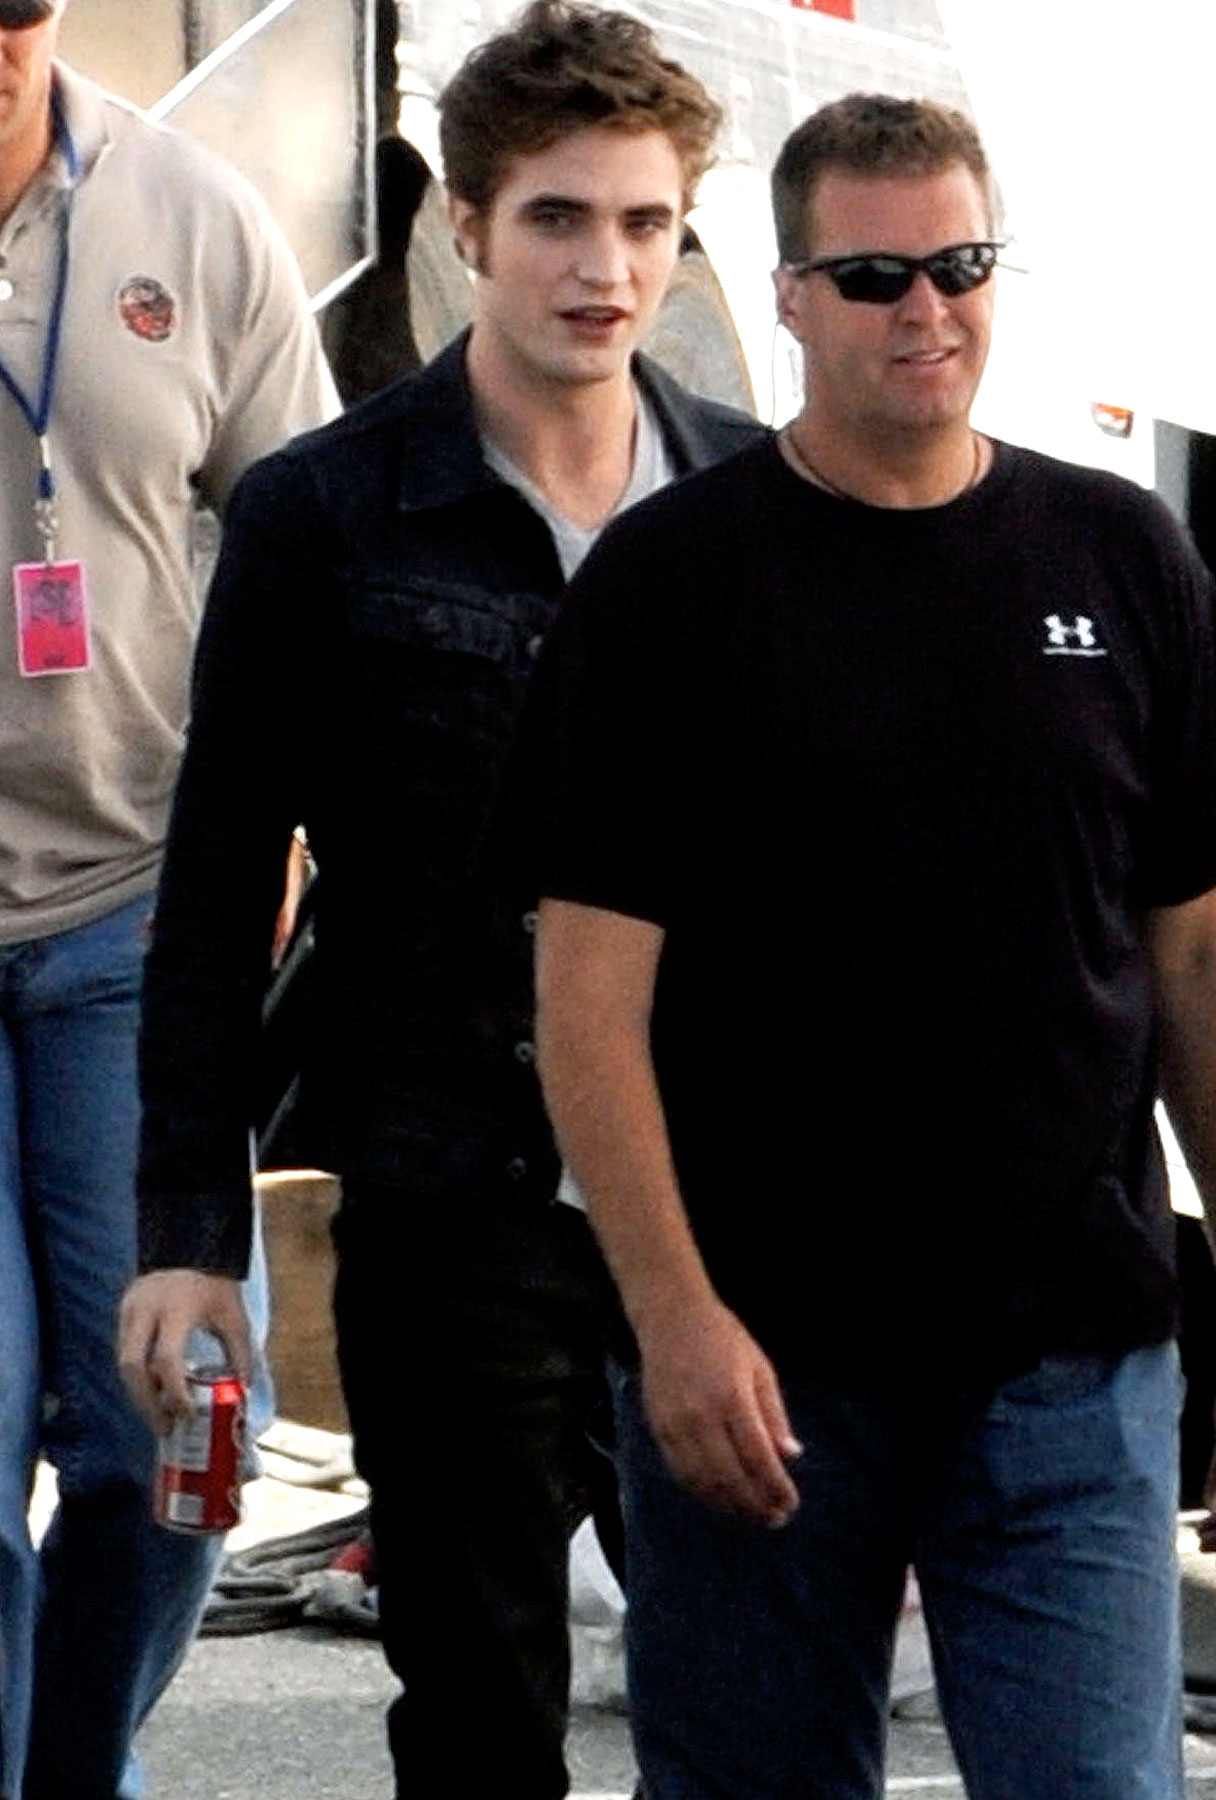 PHOTO GALLERY: Robert Pattinson Shoots Eclipse